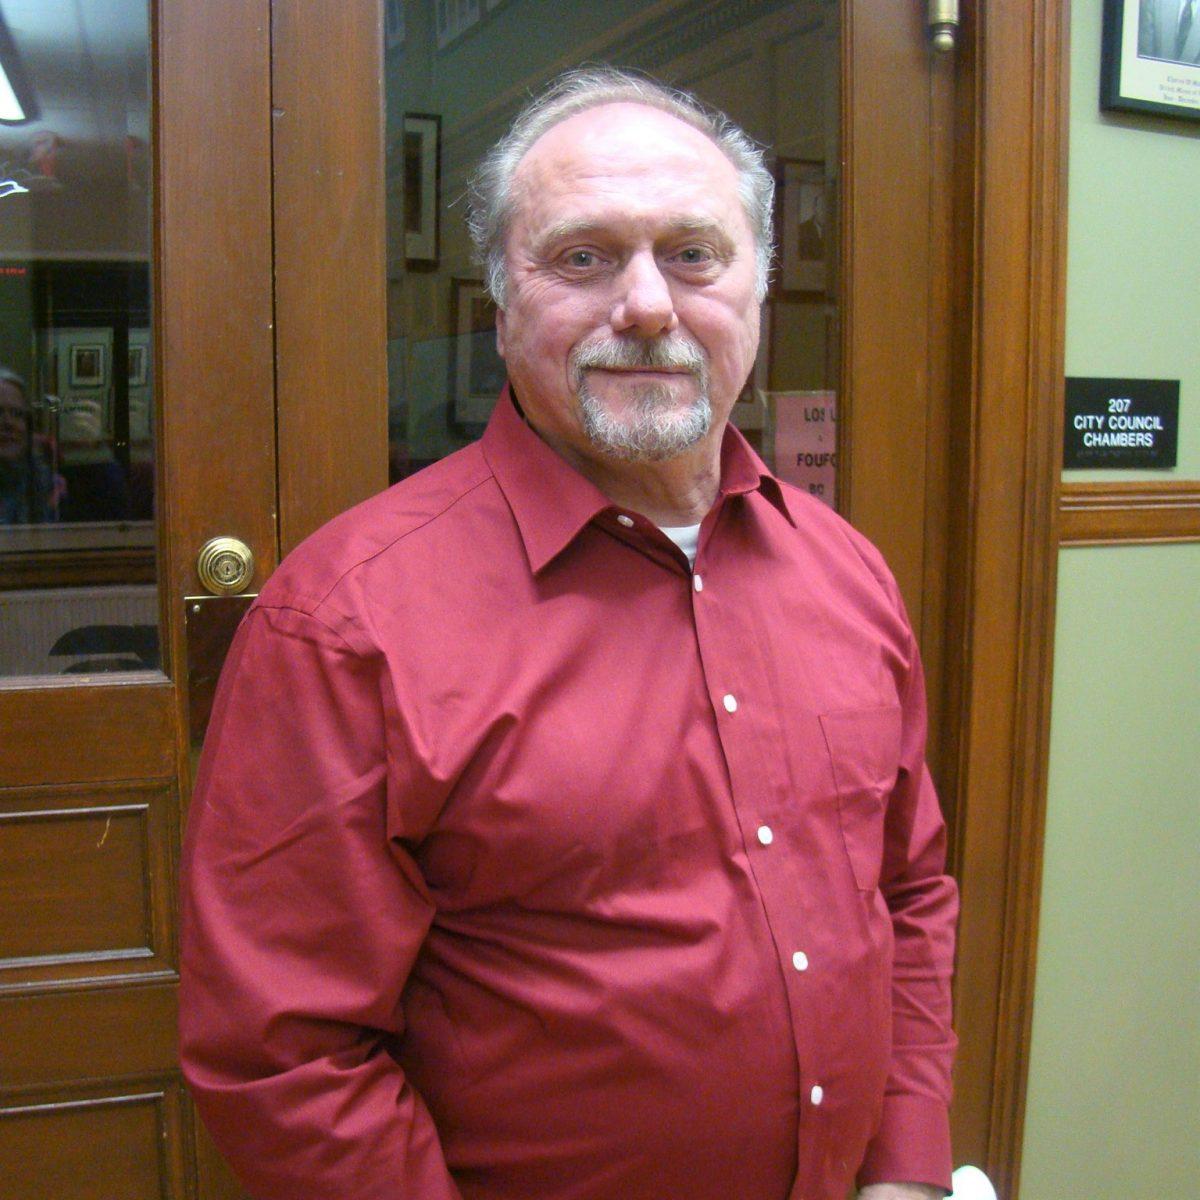 City Engineer Mark Cressotti